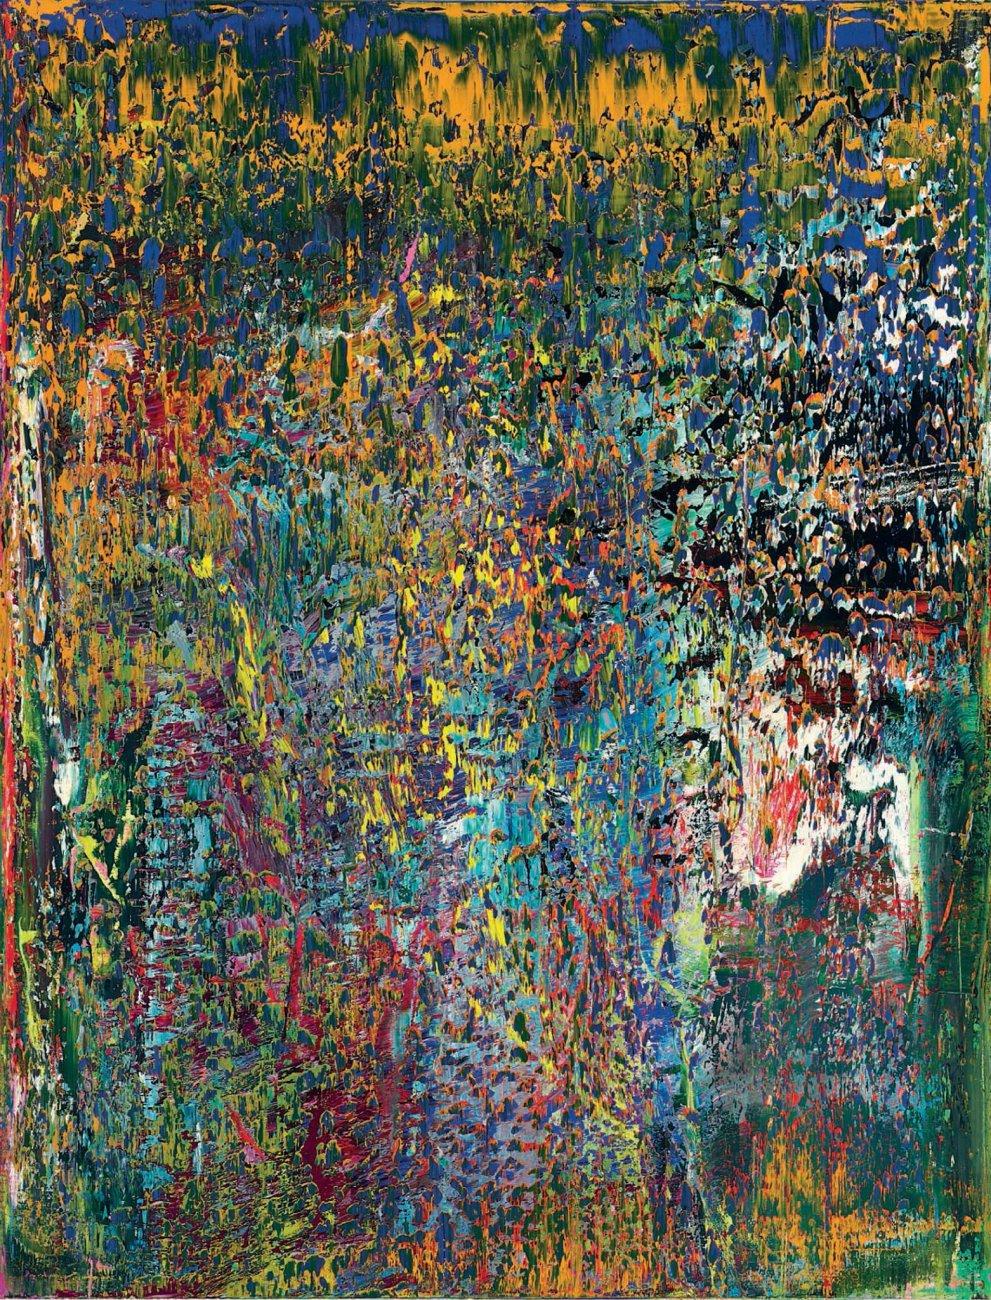 gerhard richter painting93825394_o.jpg